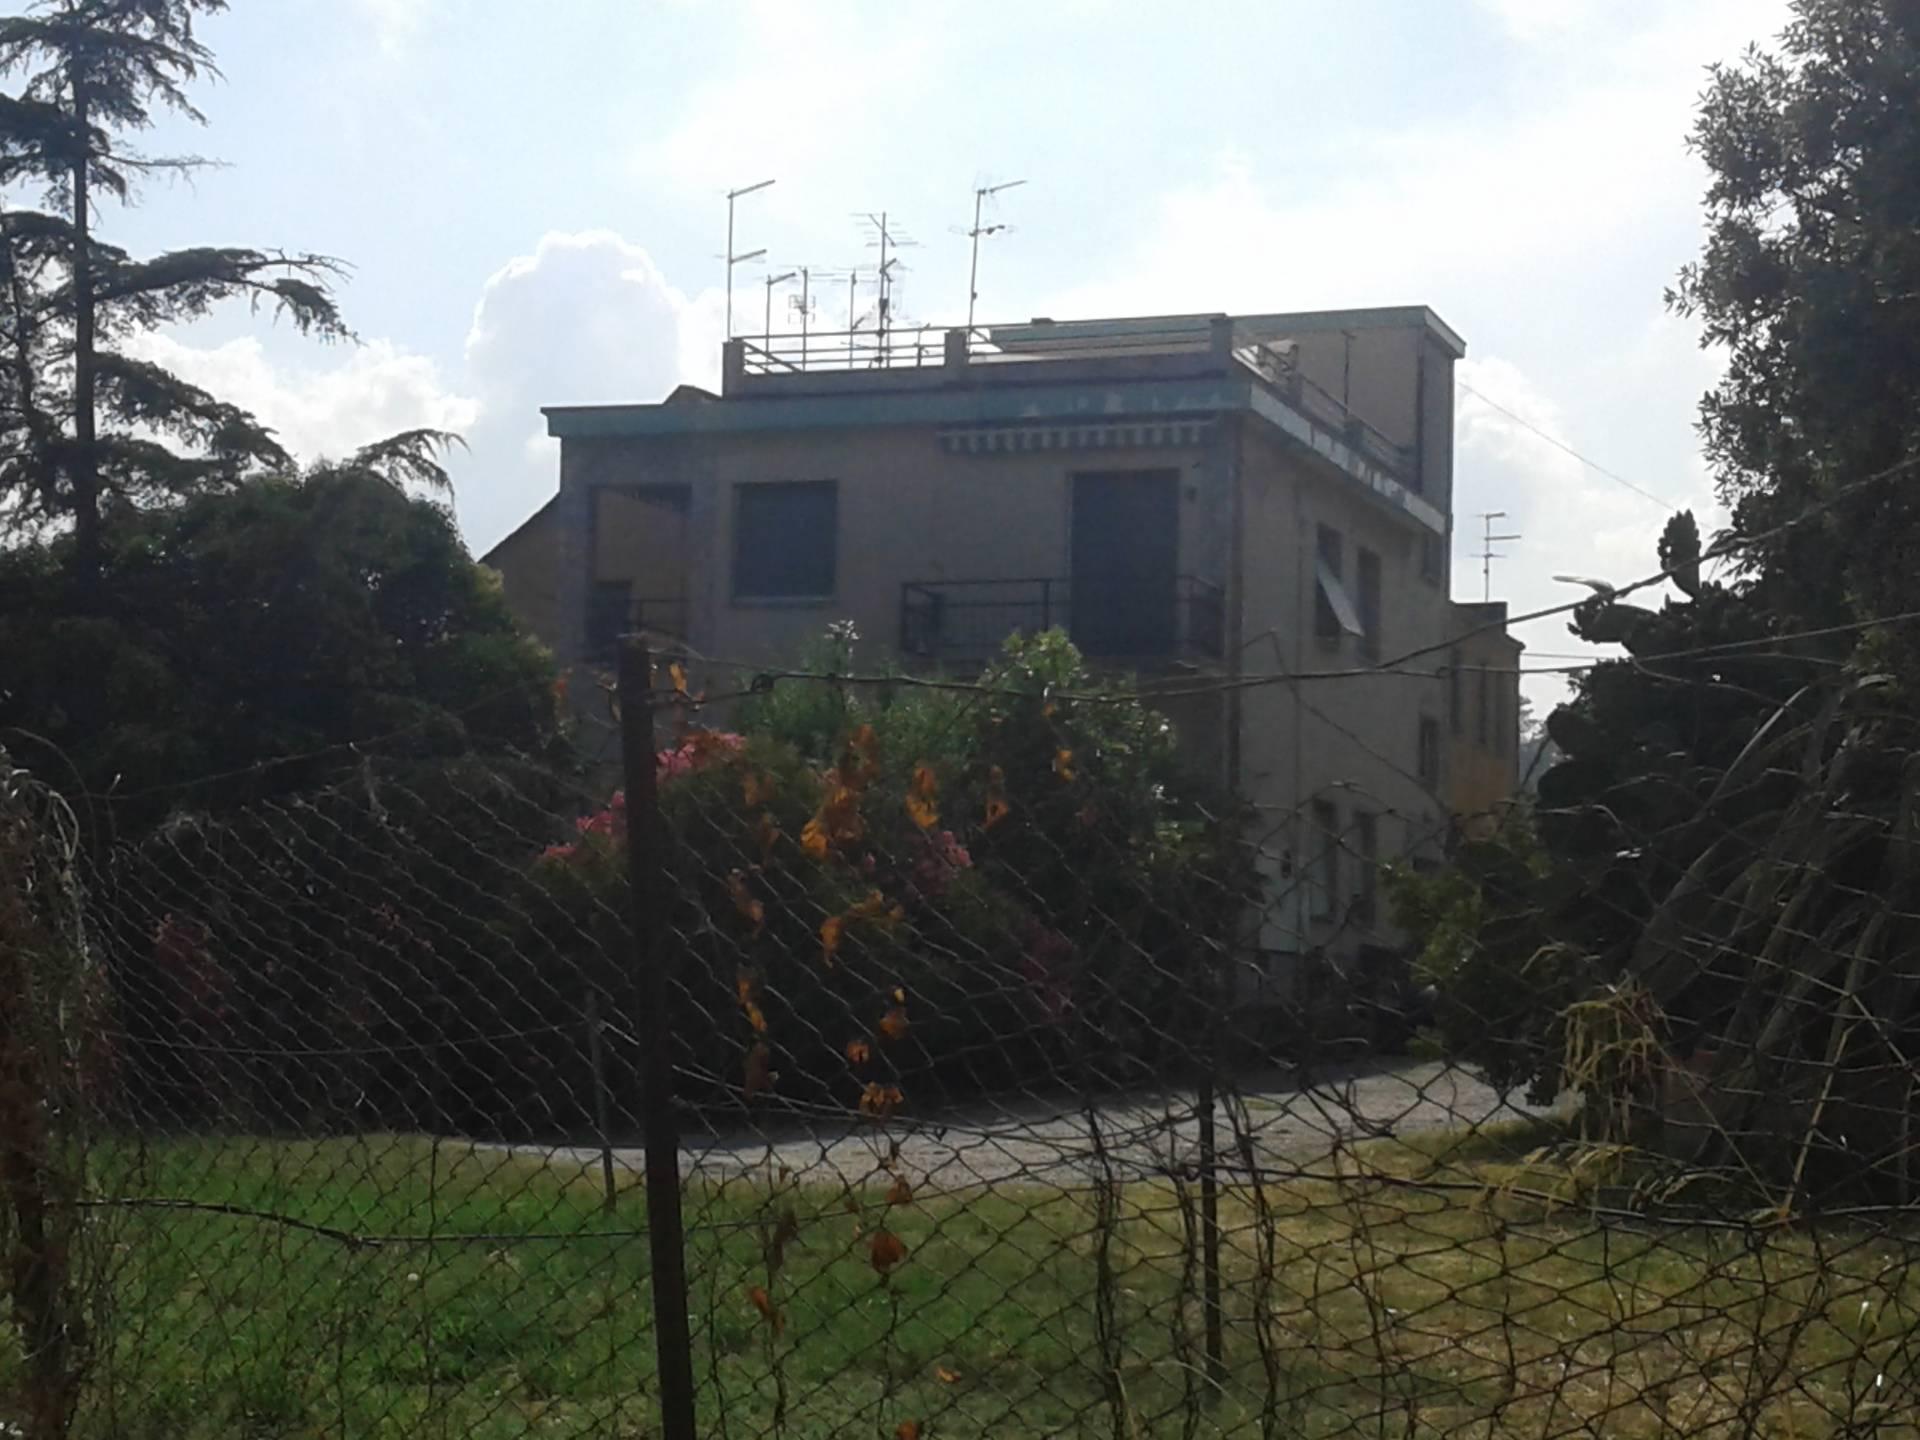 APPARTAMENTO in Affitto a LeginoZinola, Savona (SAVONA)